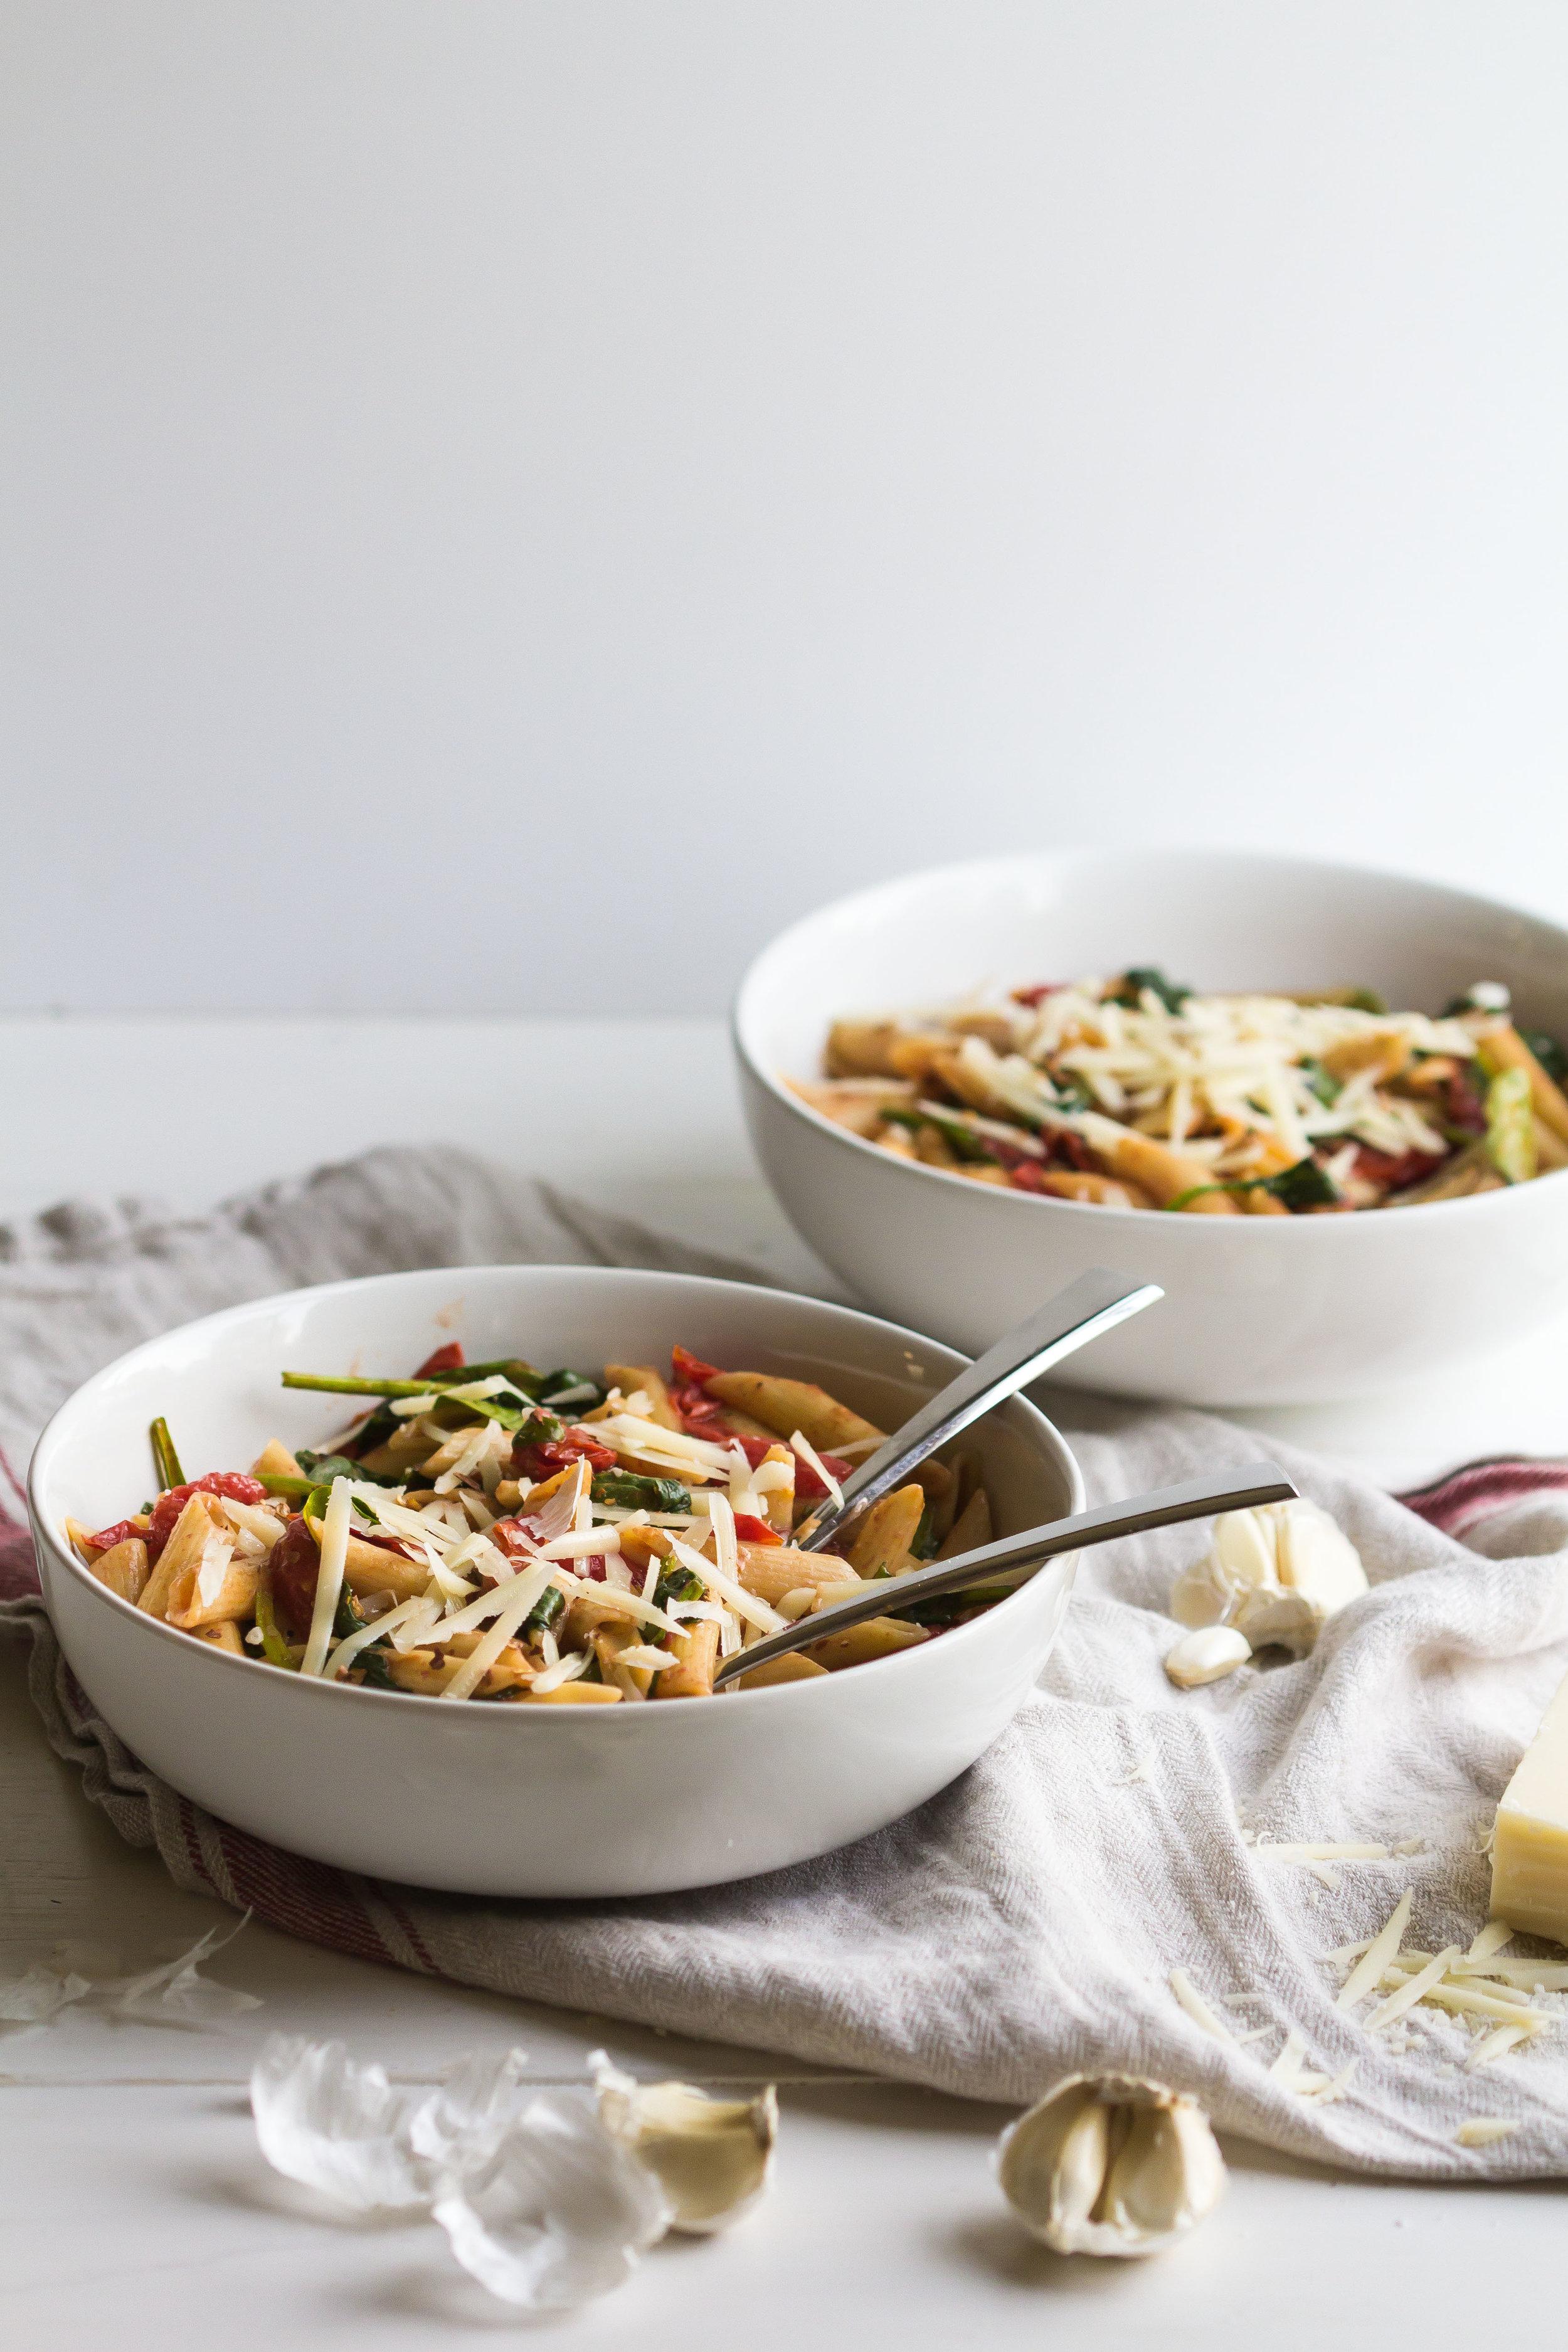 Weeknight Pasta with Cherry Tomatoes + Spinach - Sarah J. Hauser-7.jpg